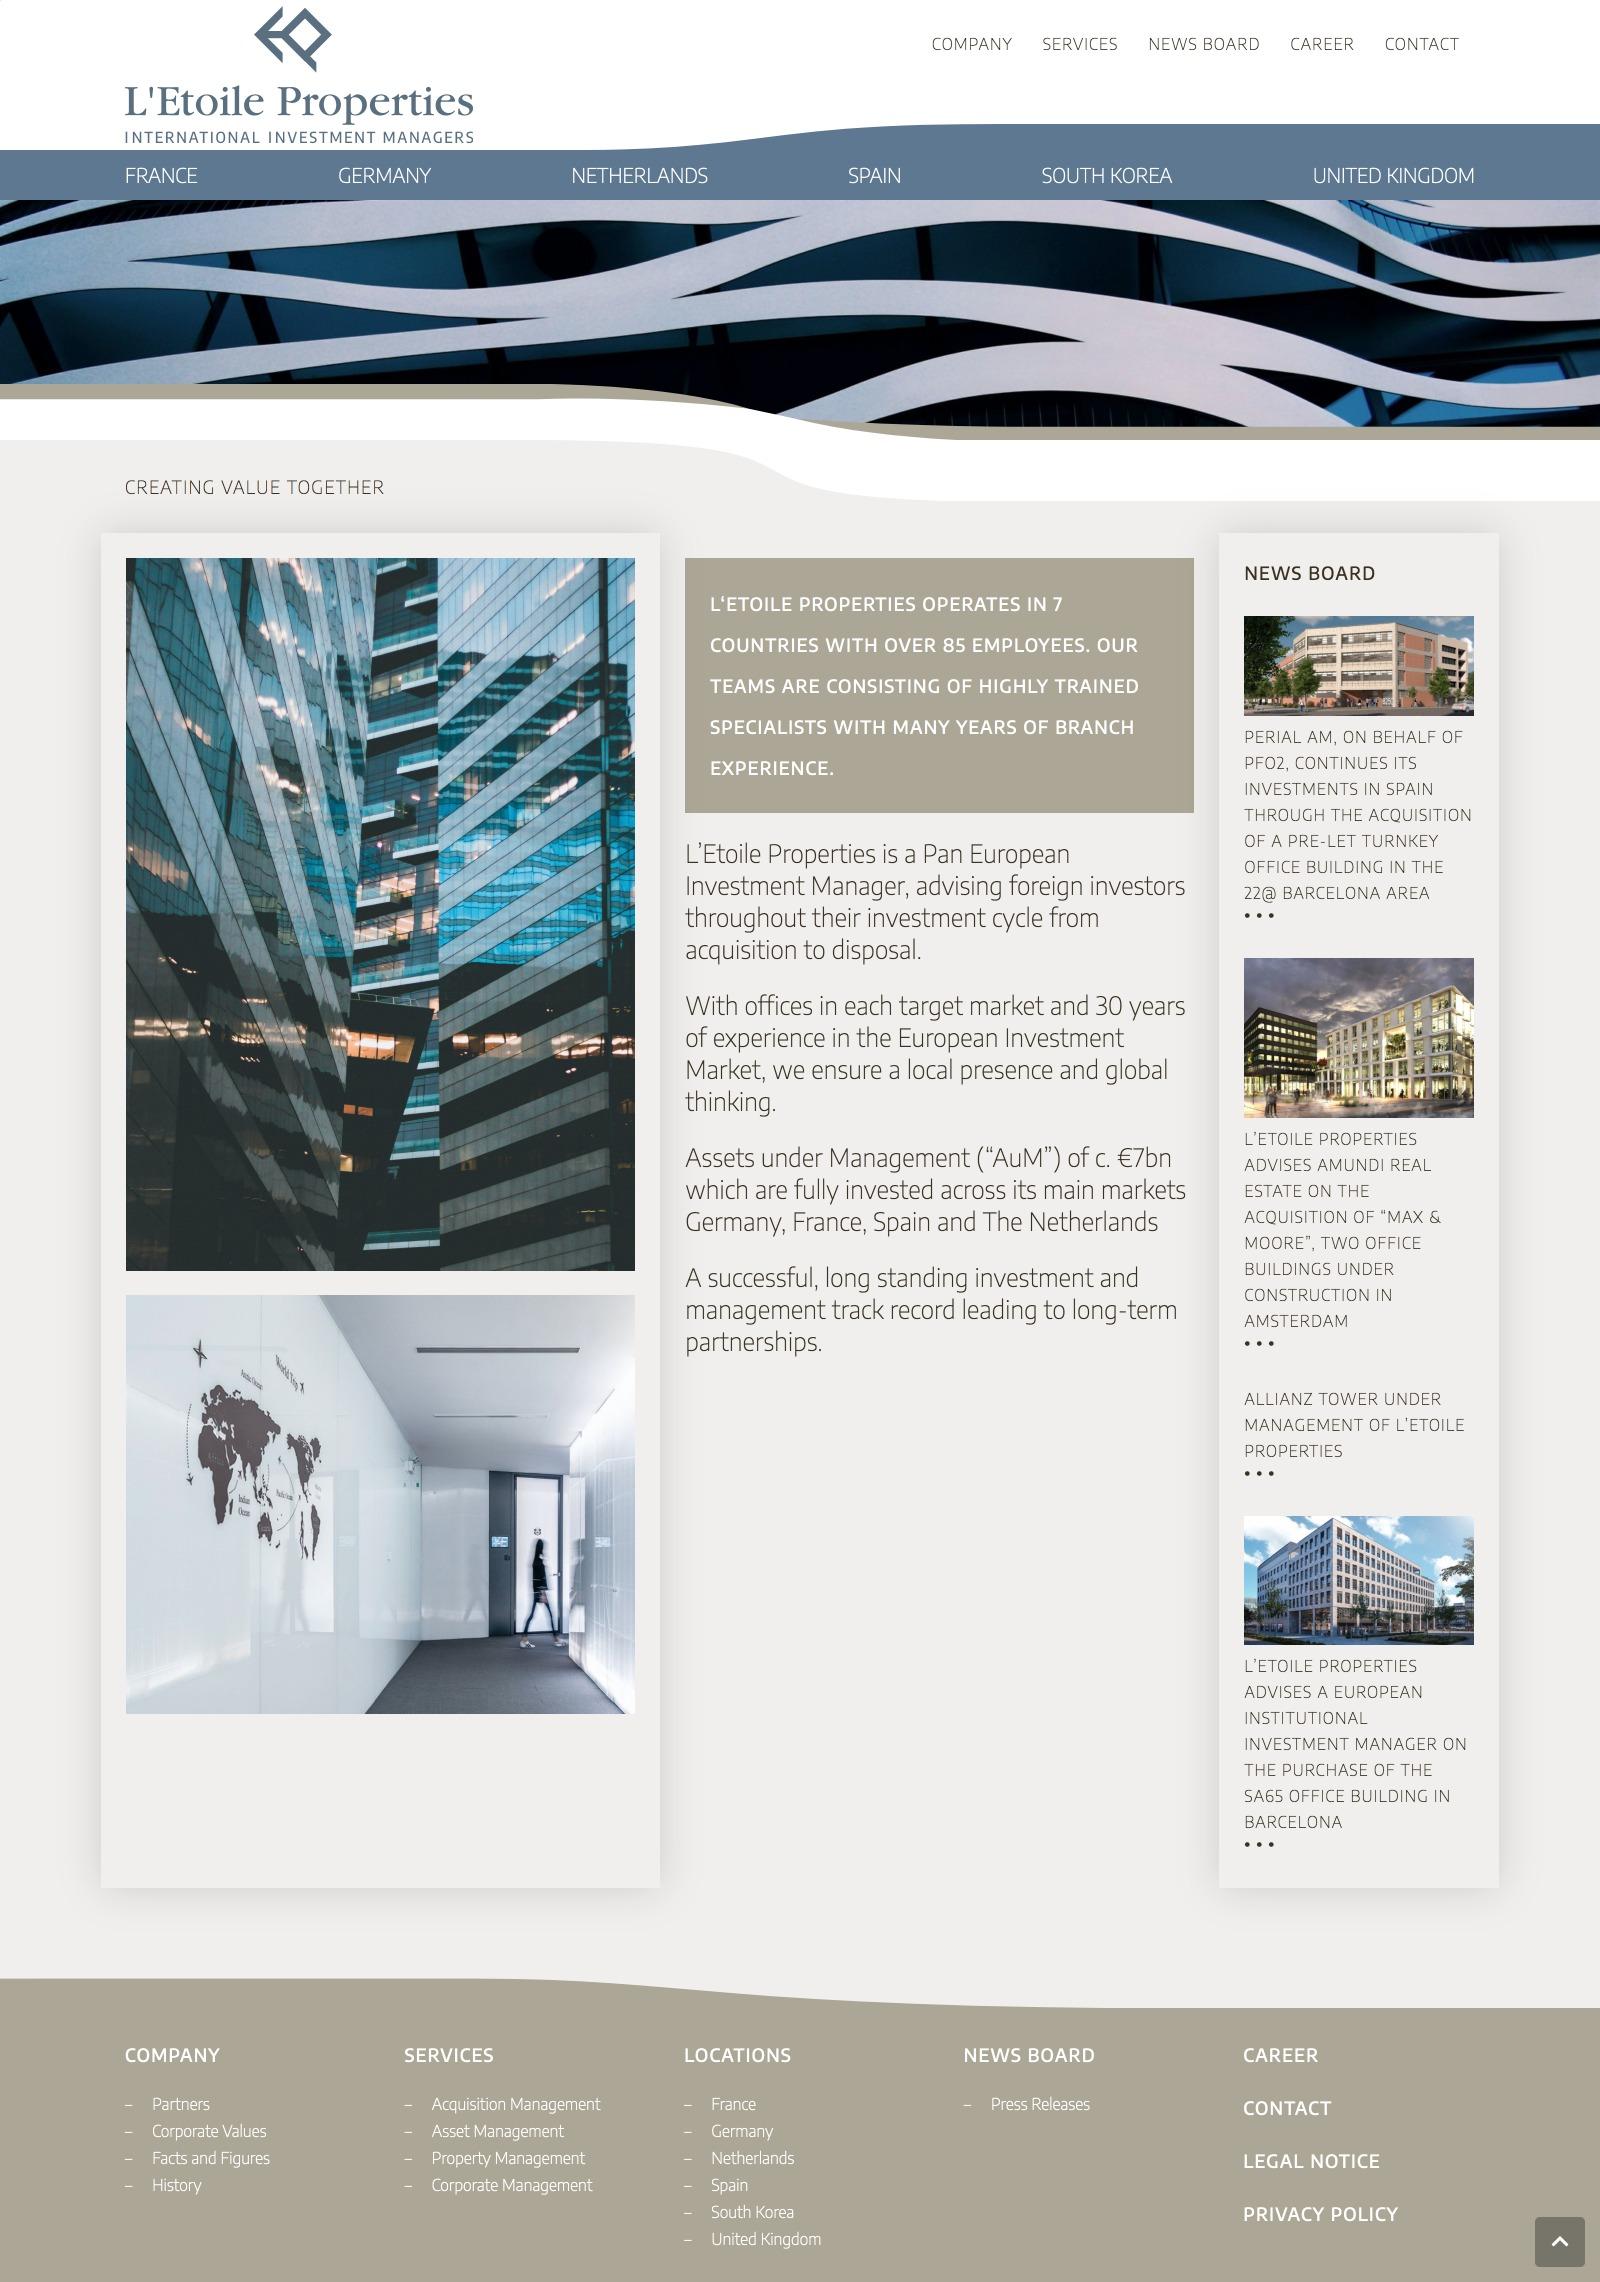 L'Etoile Properties Website